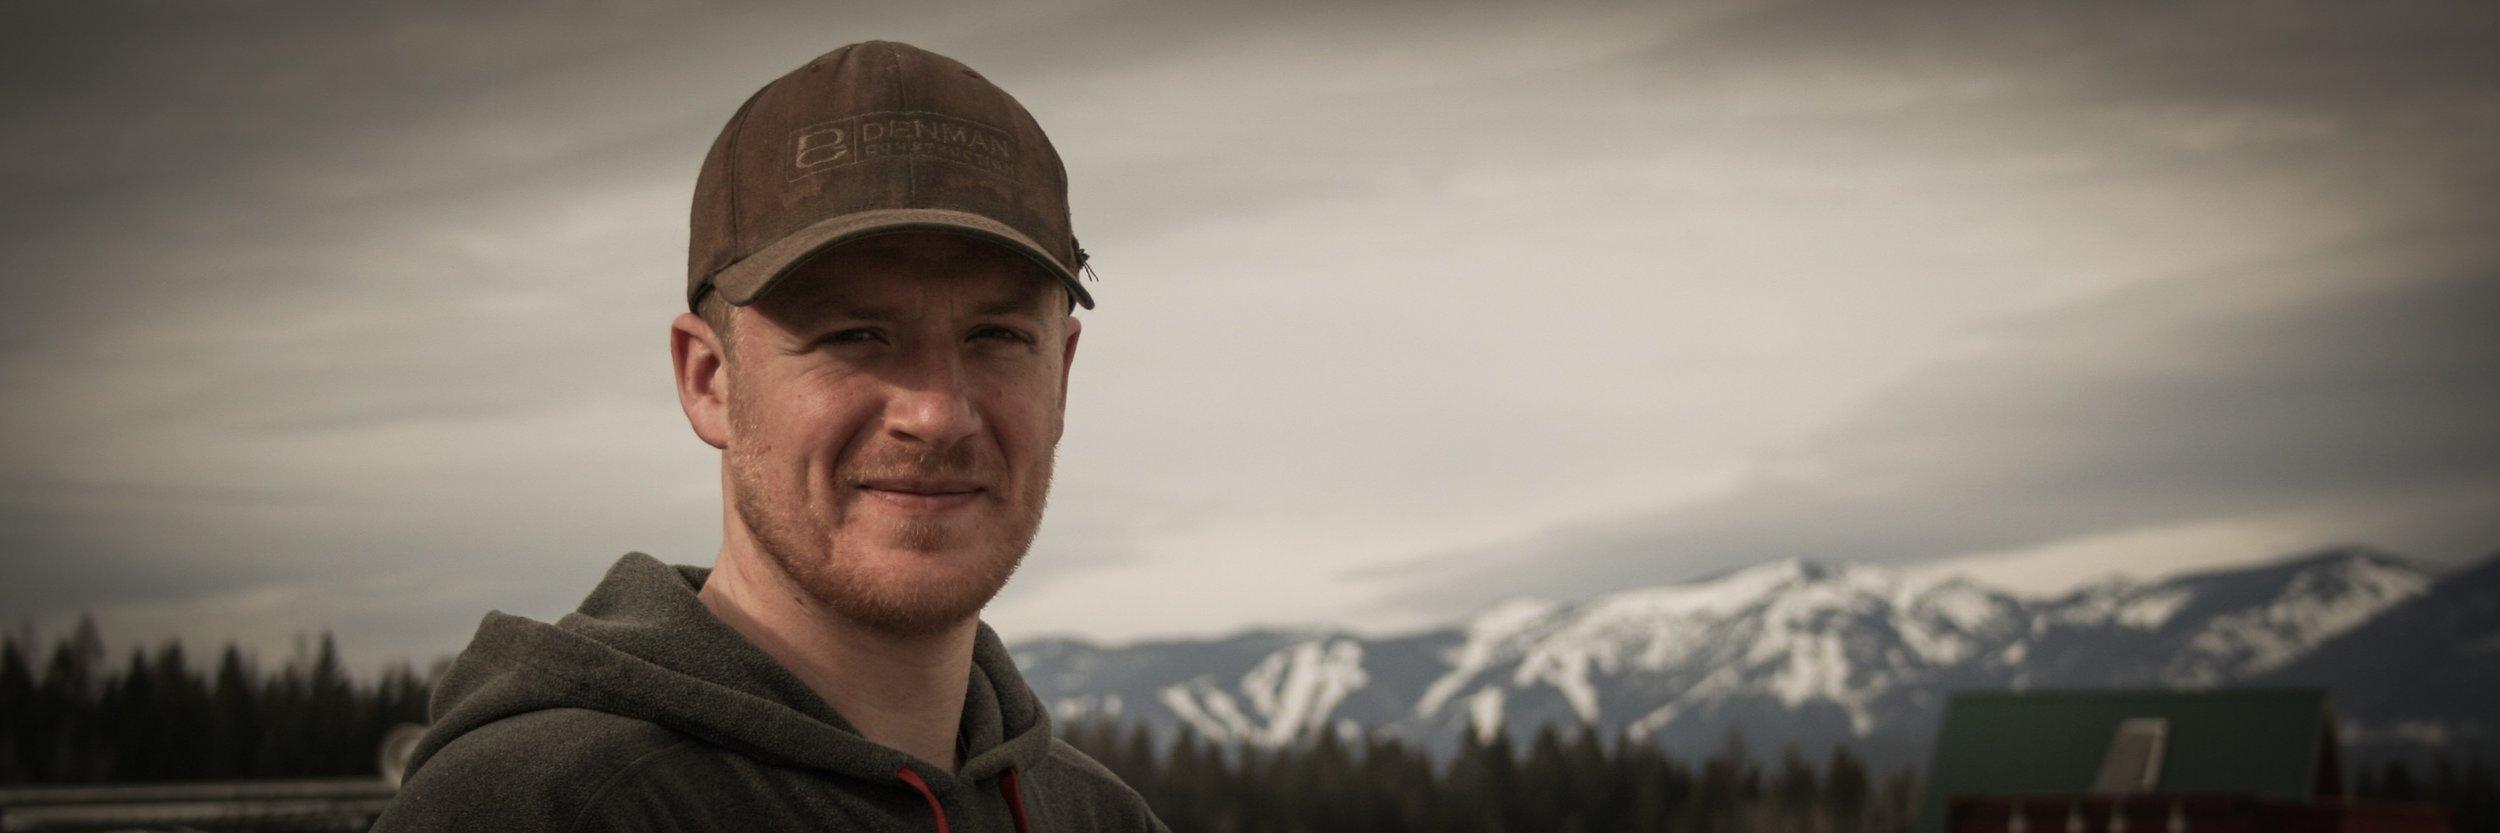 Paul Walker - Project Coordinator : Commercial since 2011